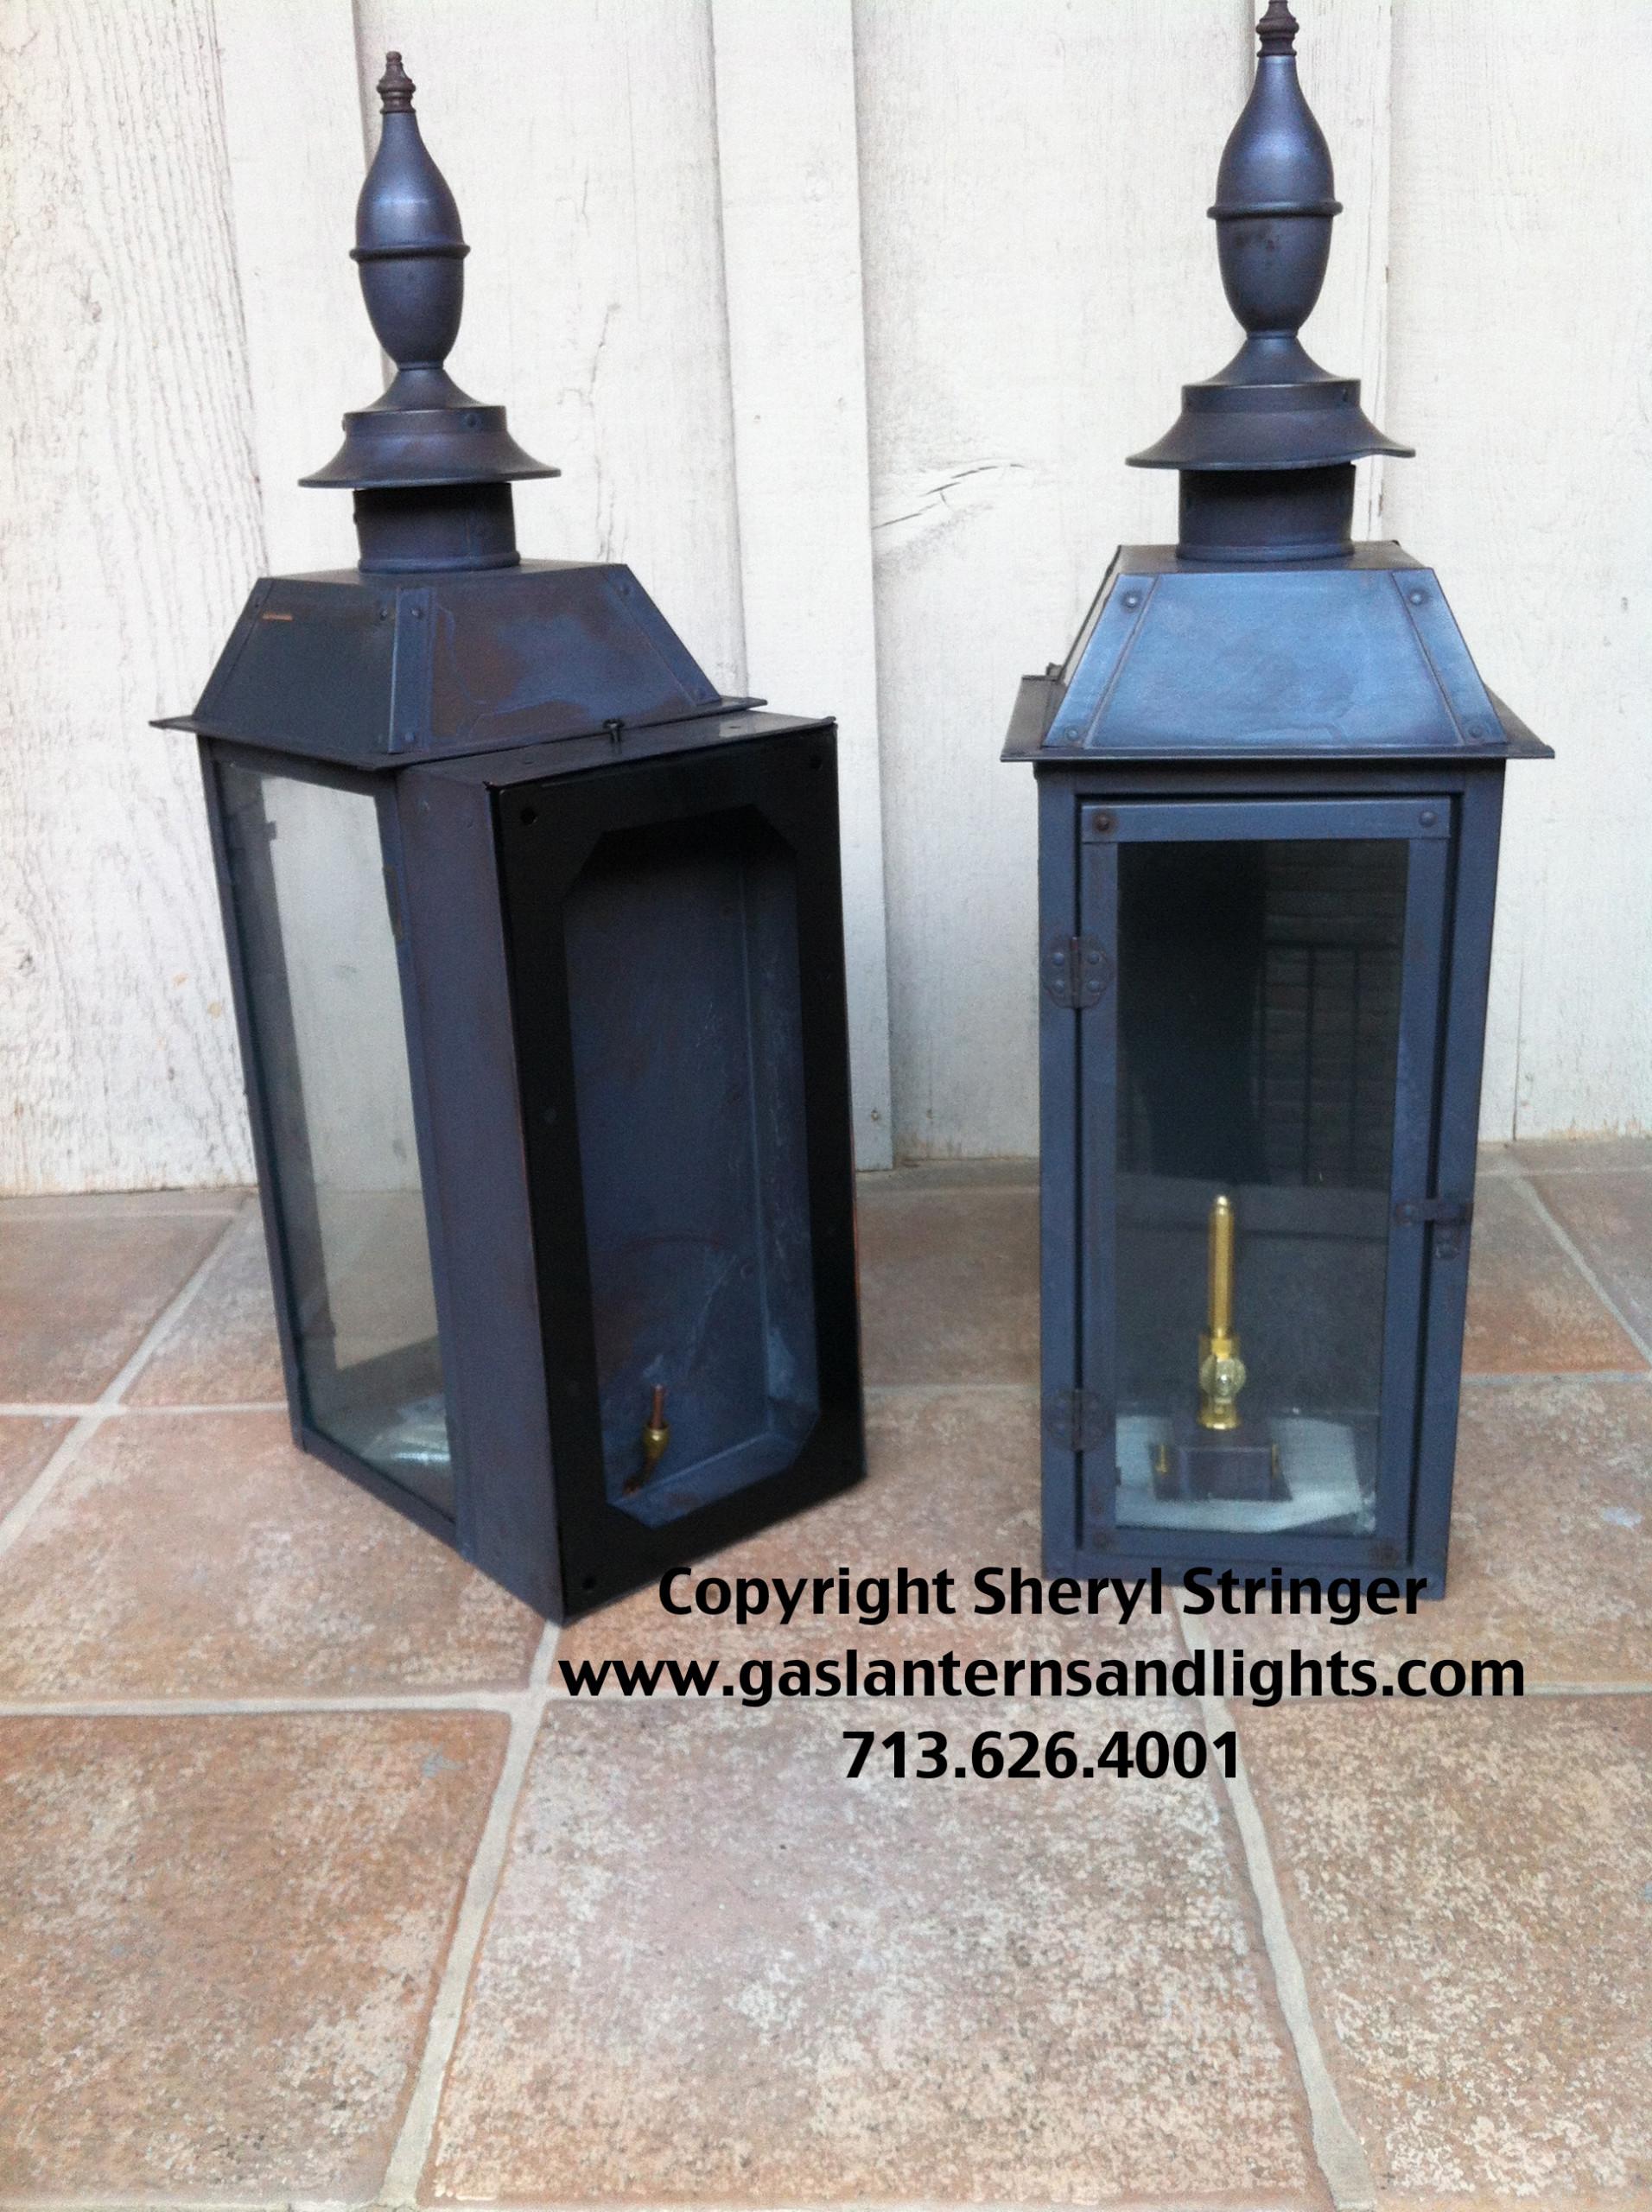 The Montgomery Gas Lantern with Dark Patina Finish By Sheryl Stringer